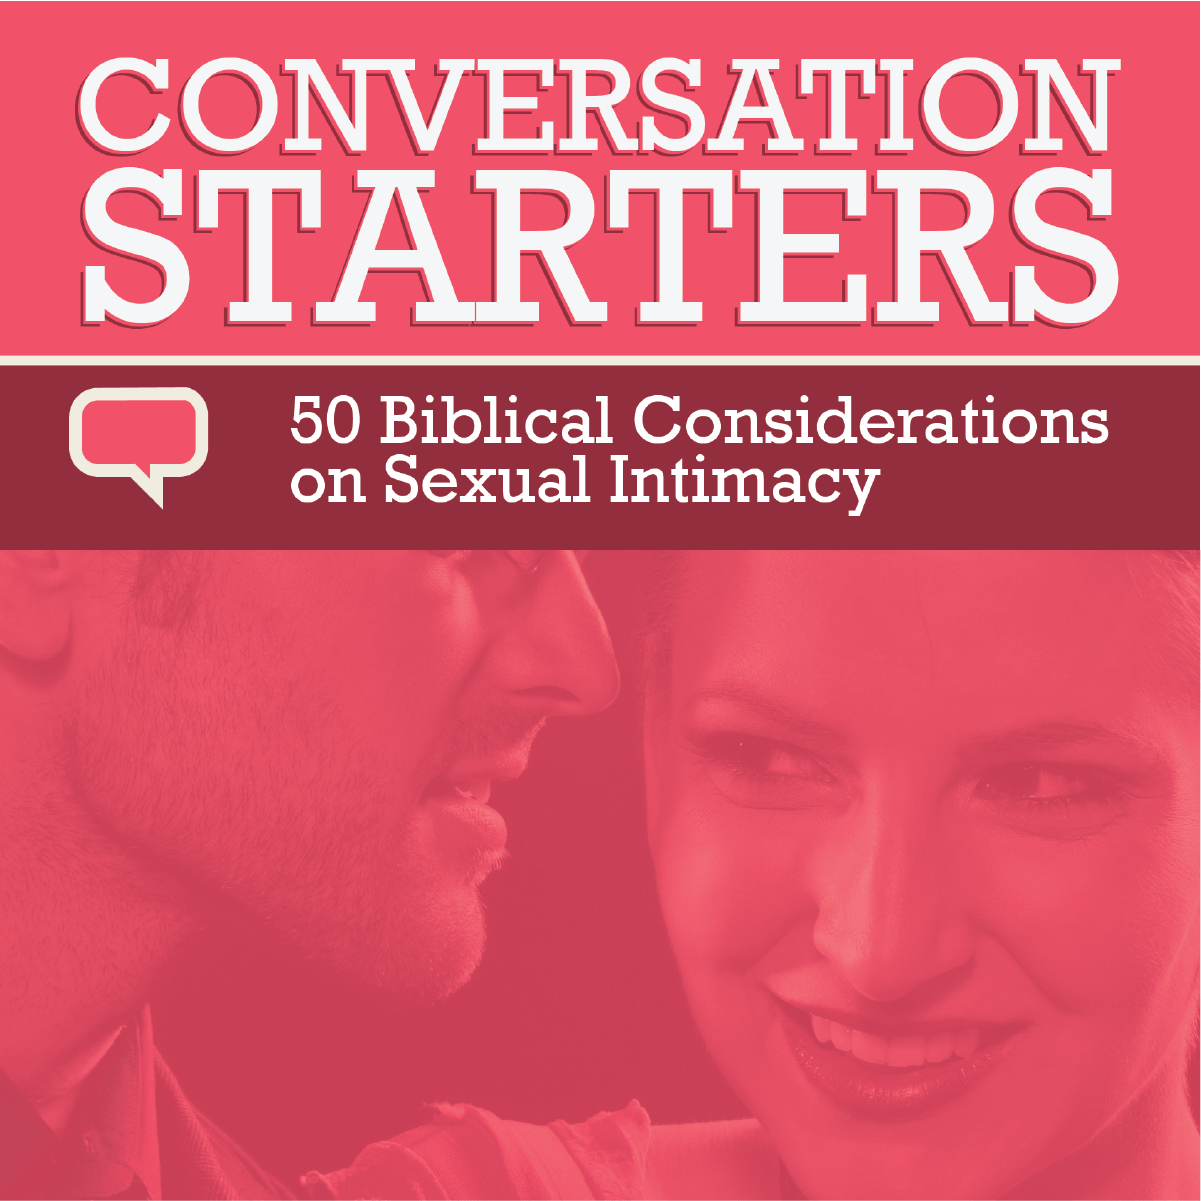 Starters sexual conversation 15 Tinder